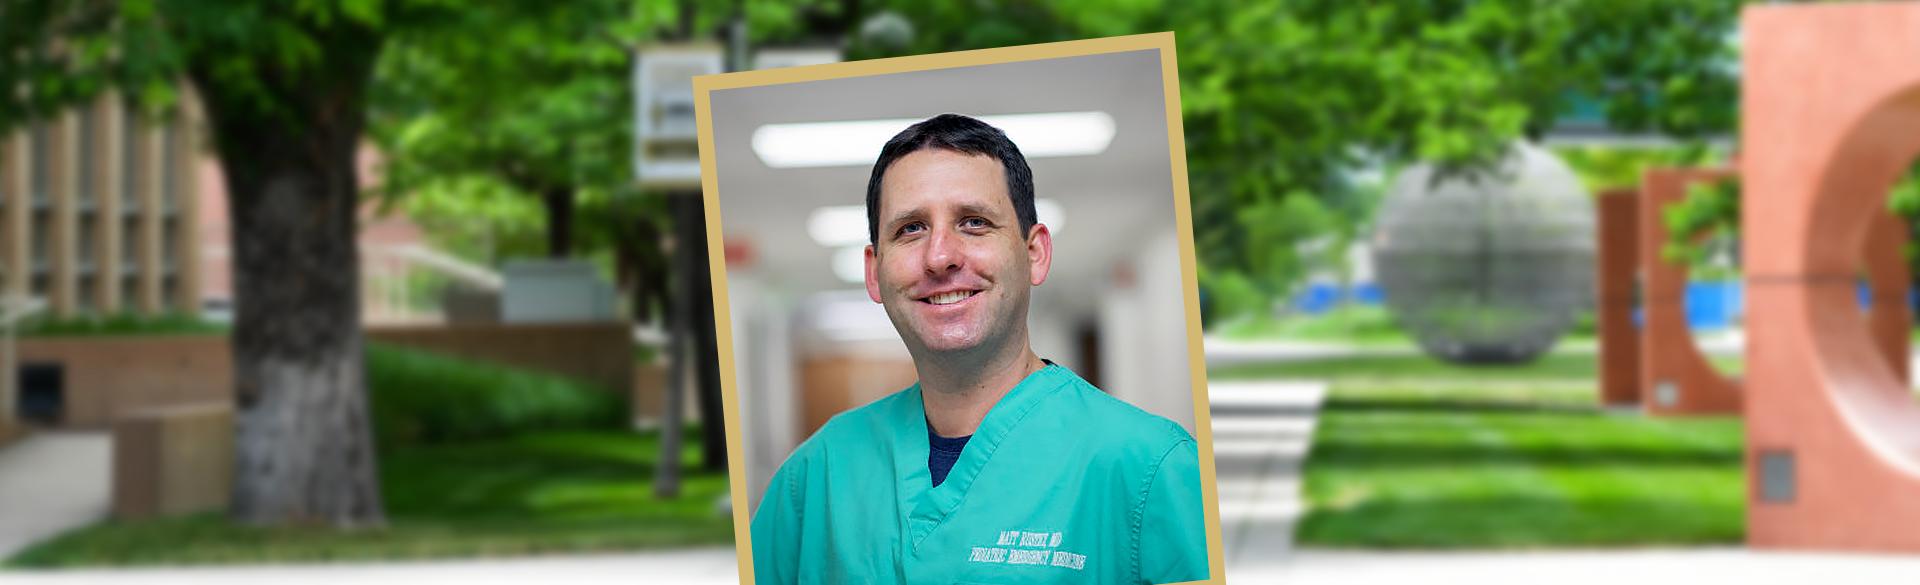 Matthew Rustici, MD - CU School of Medicine